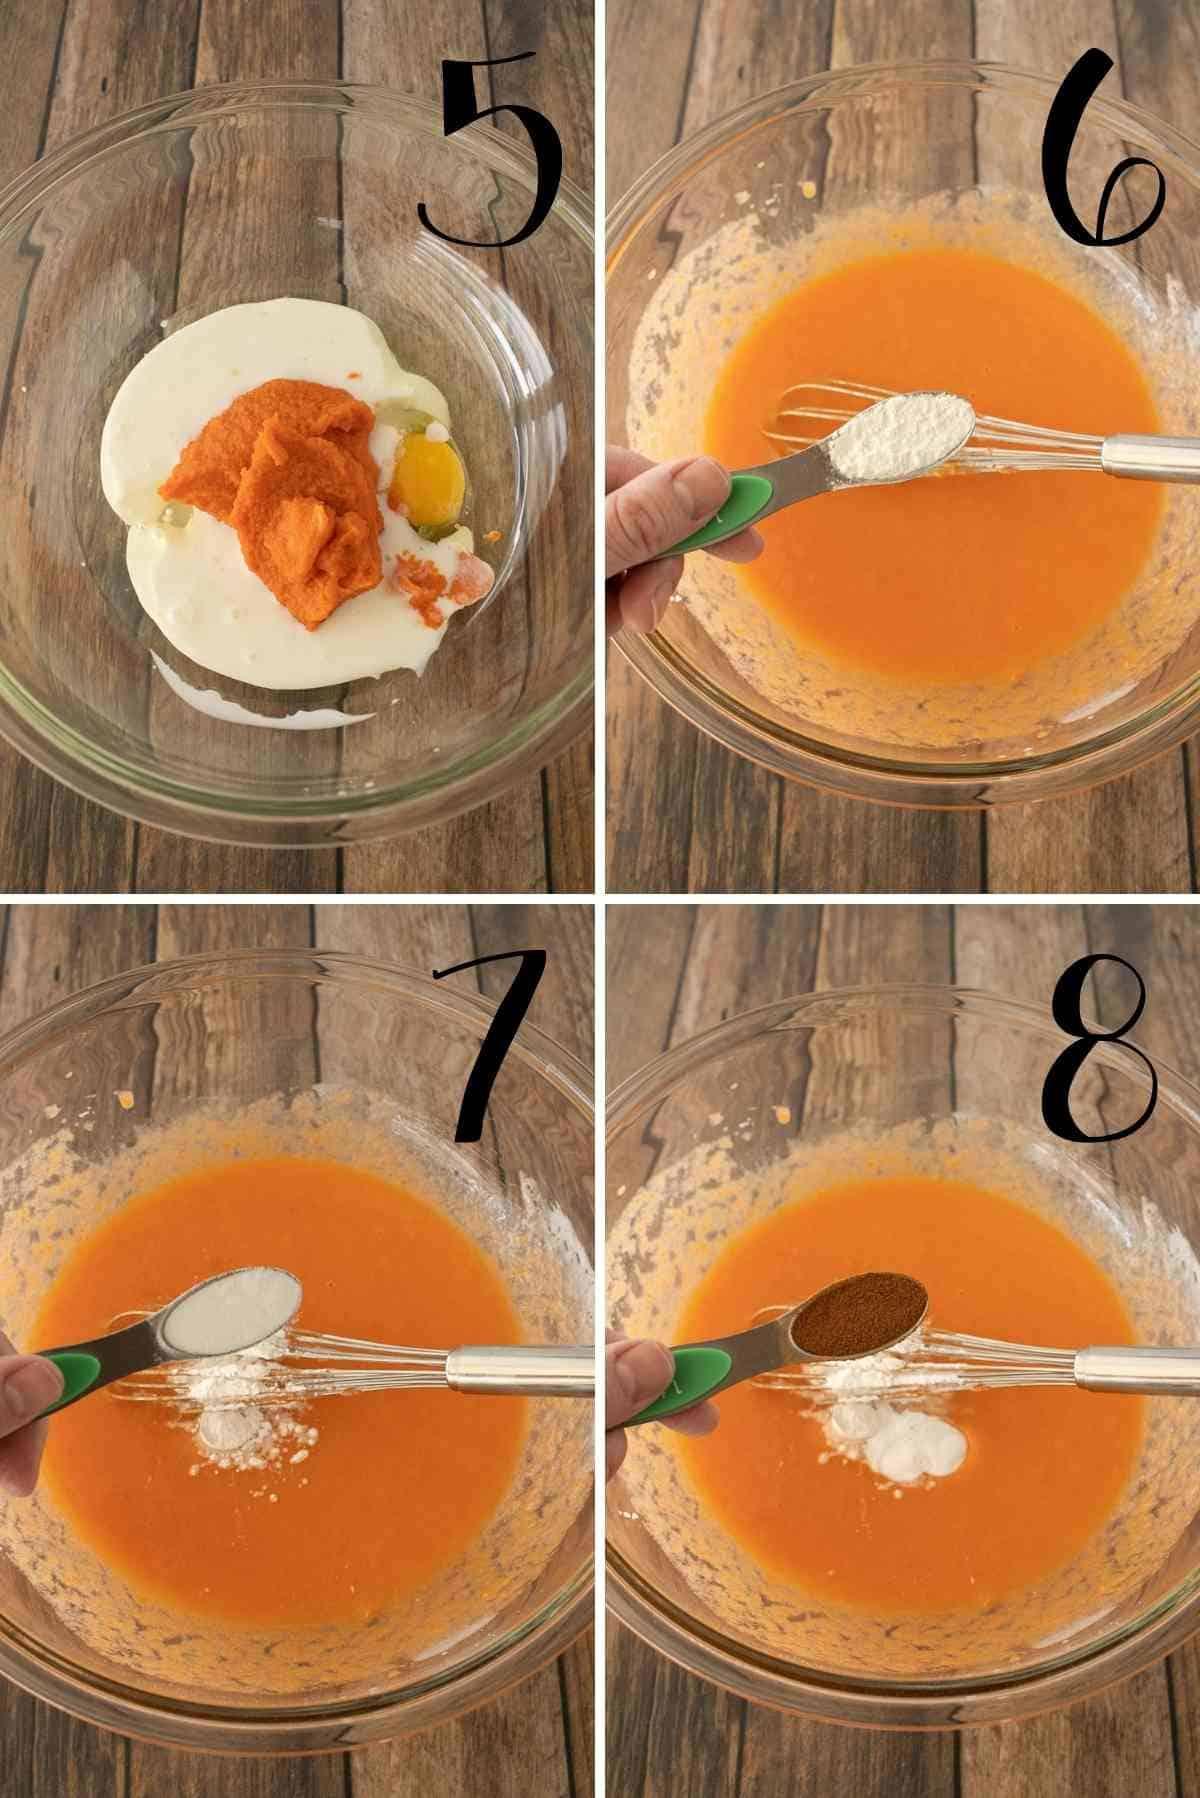 Add pureed carrots, baking powder, baking soda, and cinnamon.